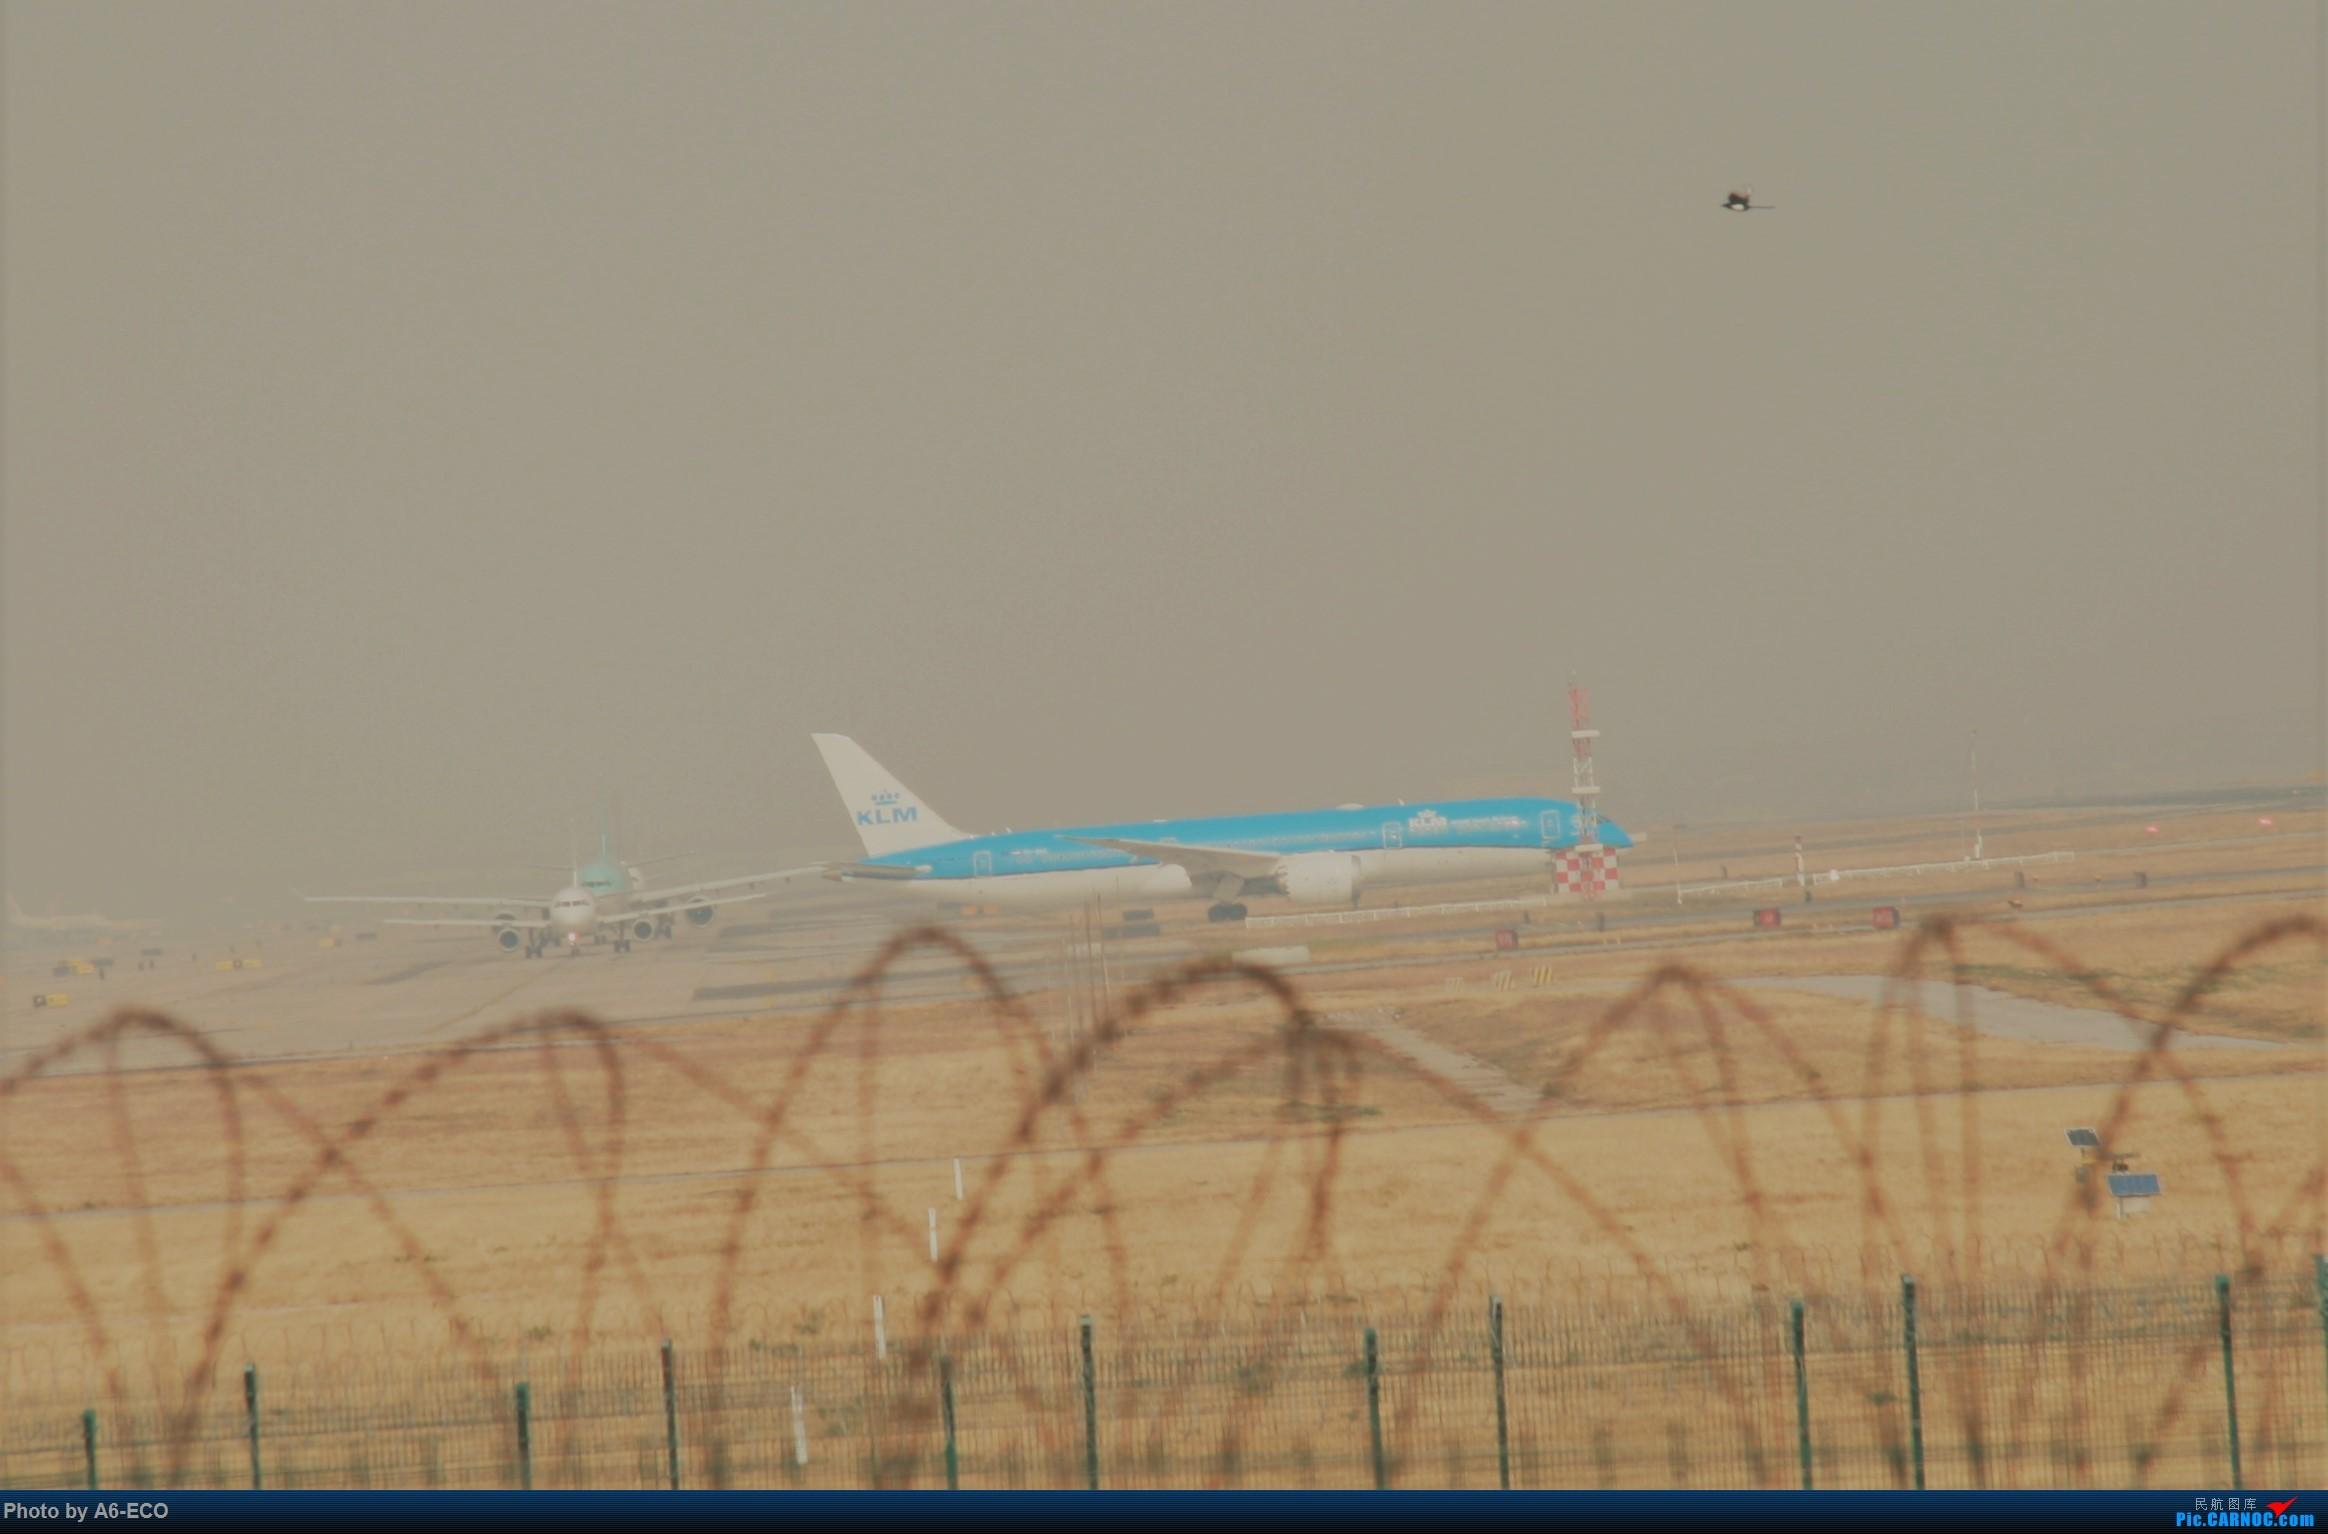 Re:[原创]【Siriの拍机】再次出现PEK BOEING 787-9 忘了 中国北京首都国际机场